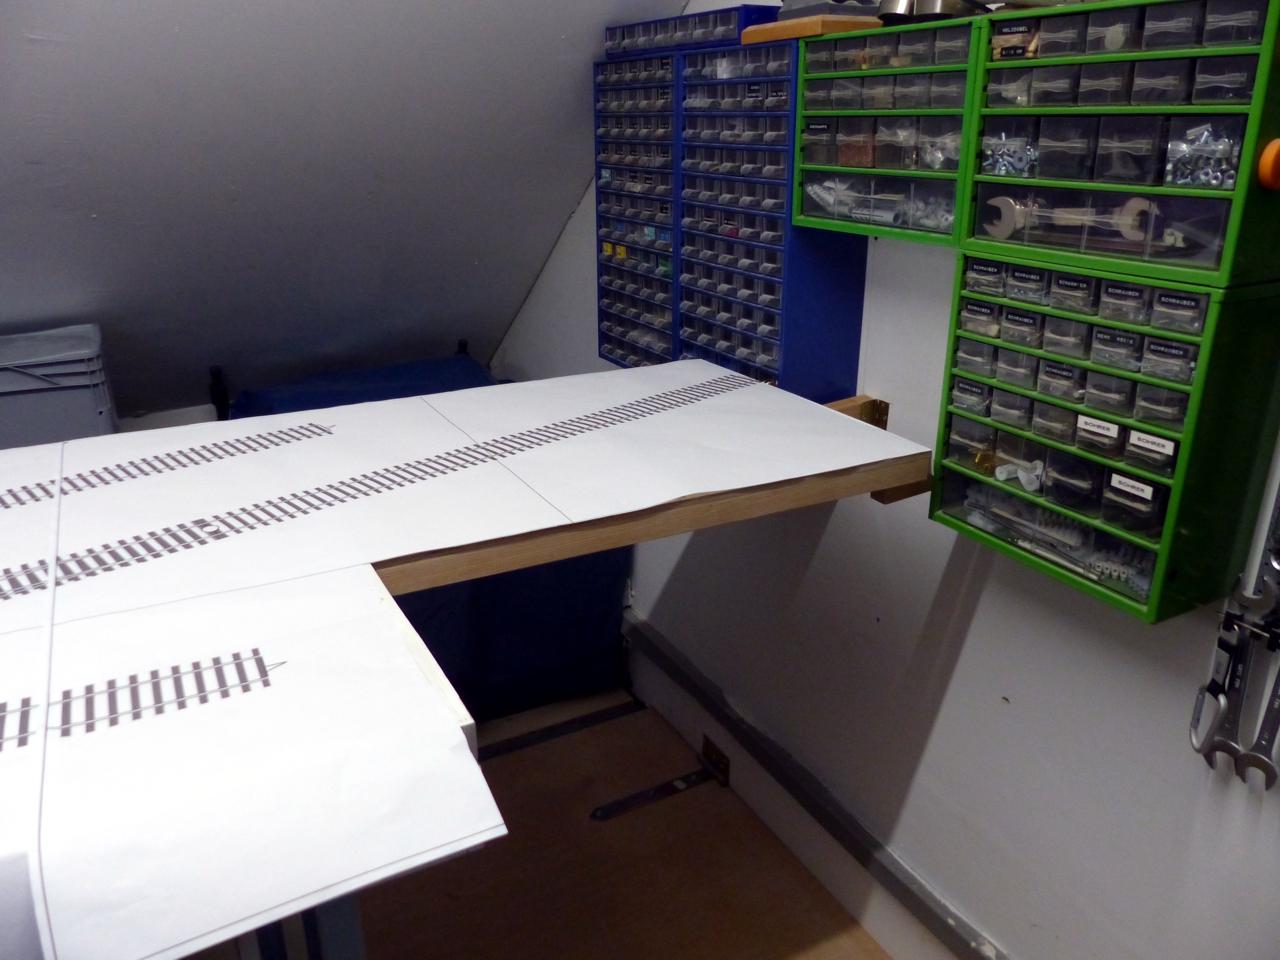 P1000874-1280.jpg